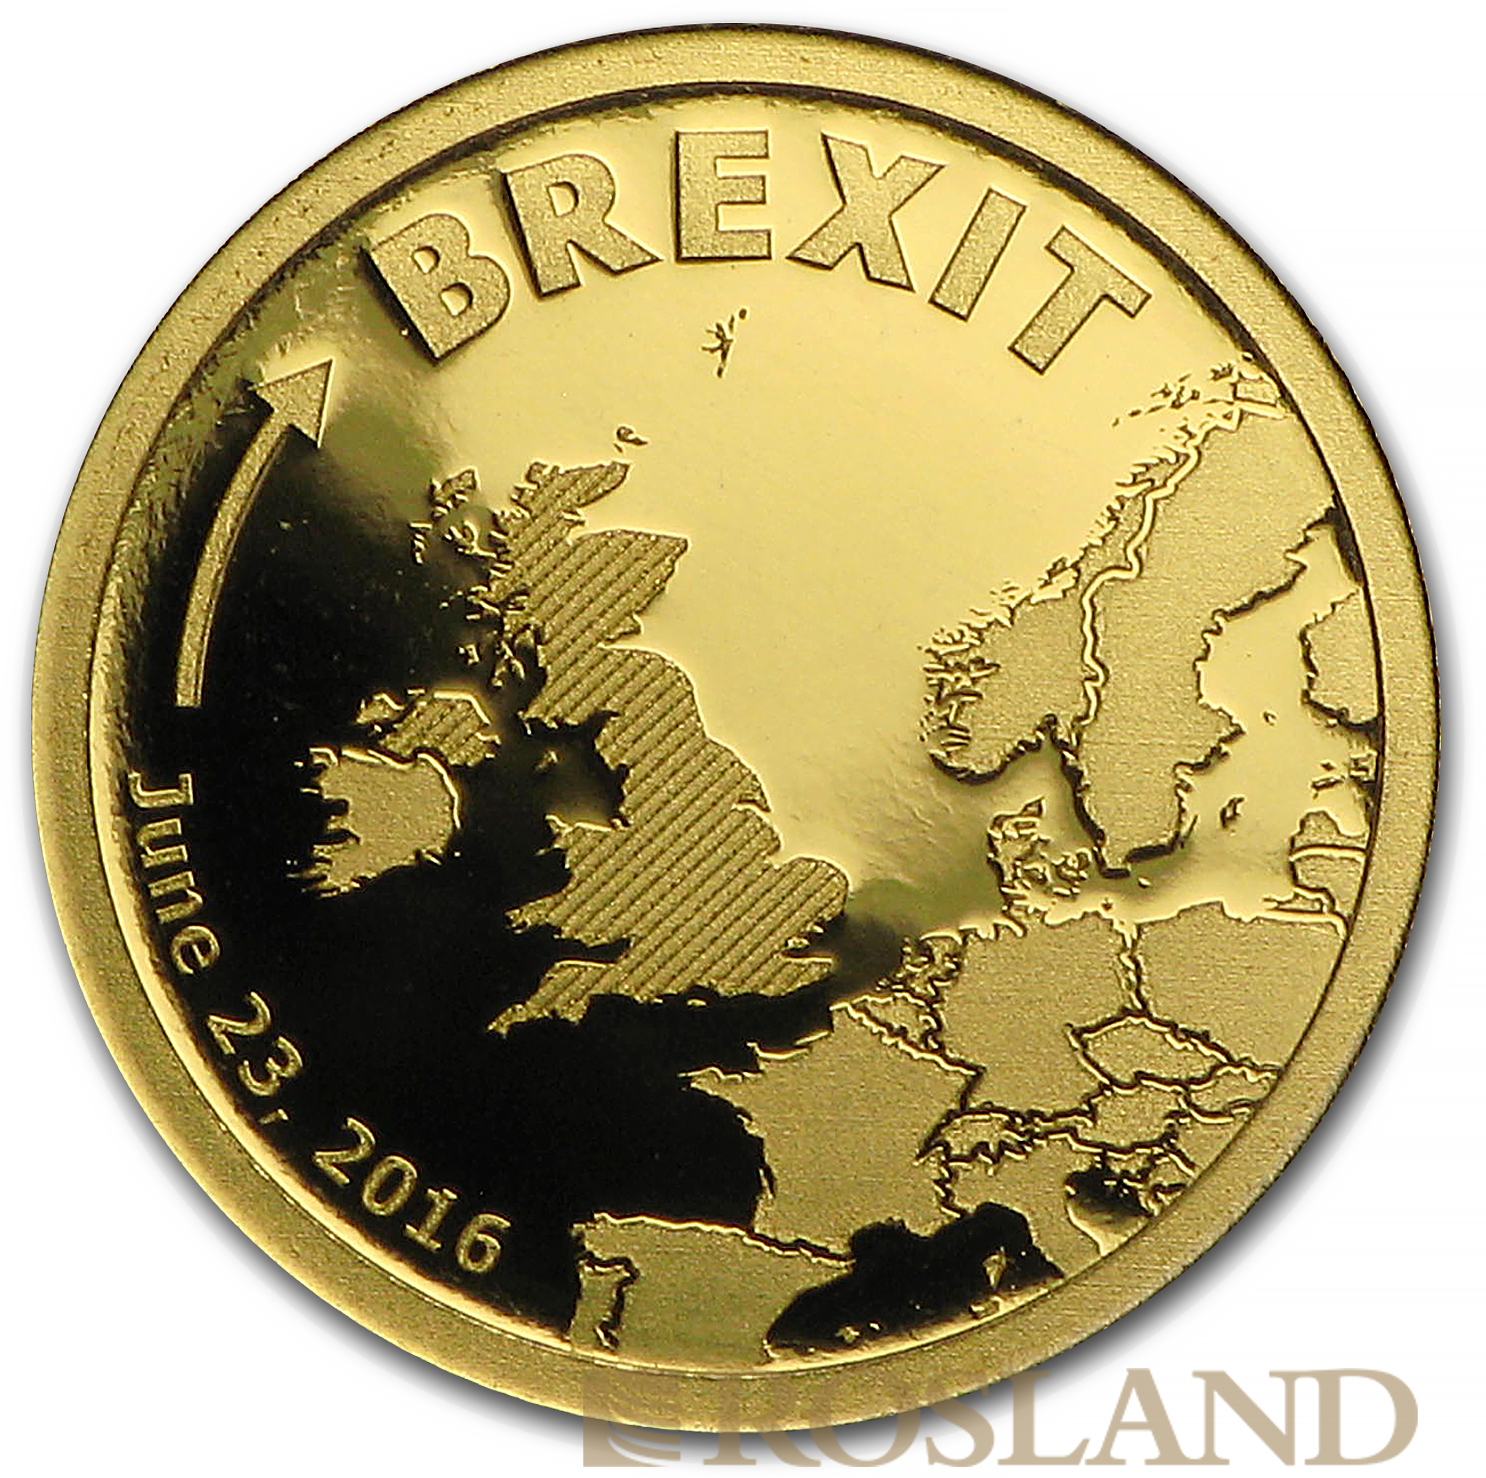 0,5 Gramm Goldmünze Cook Islands Brexit 2016 PP